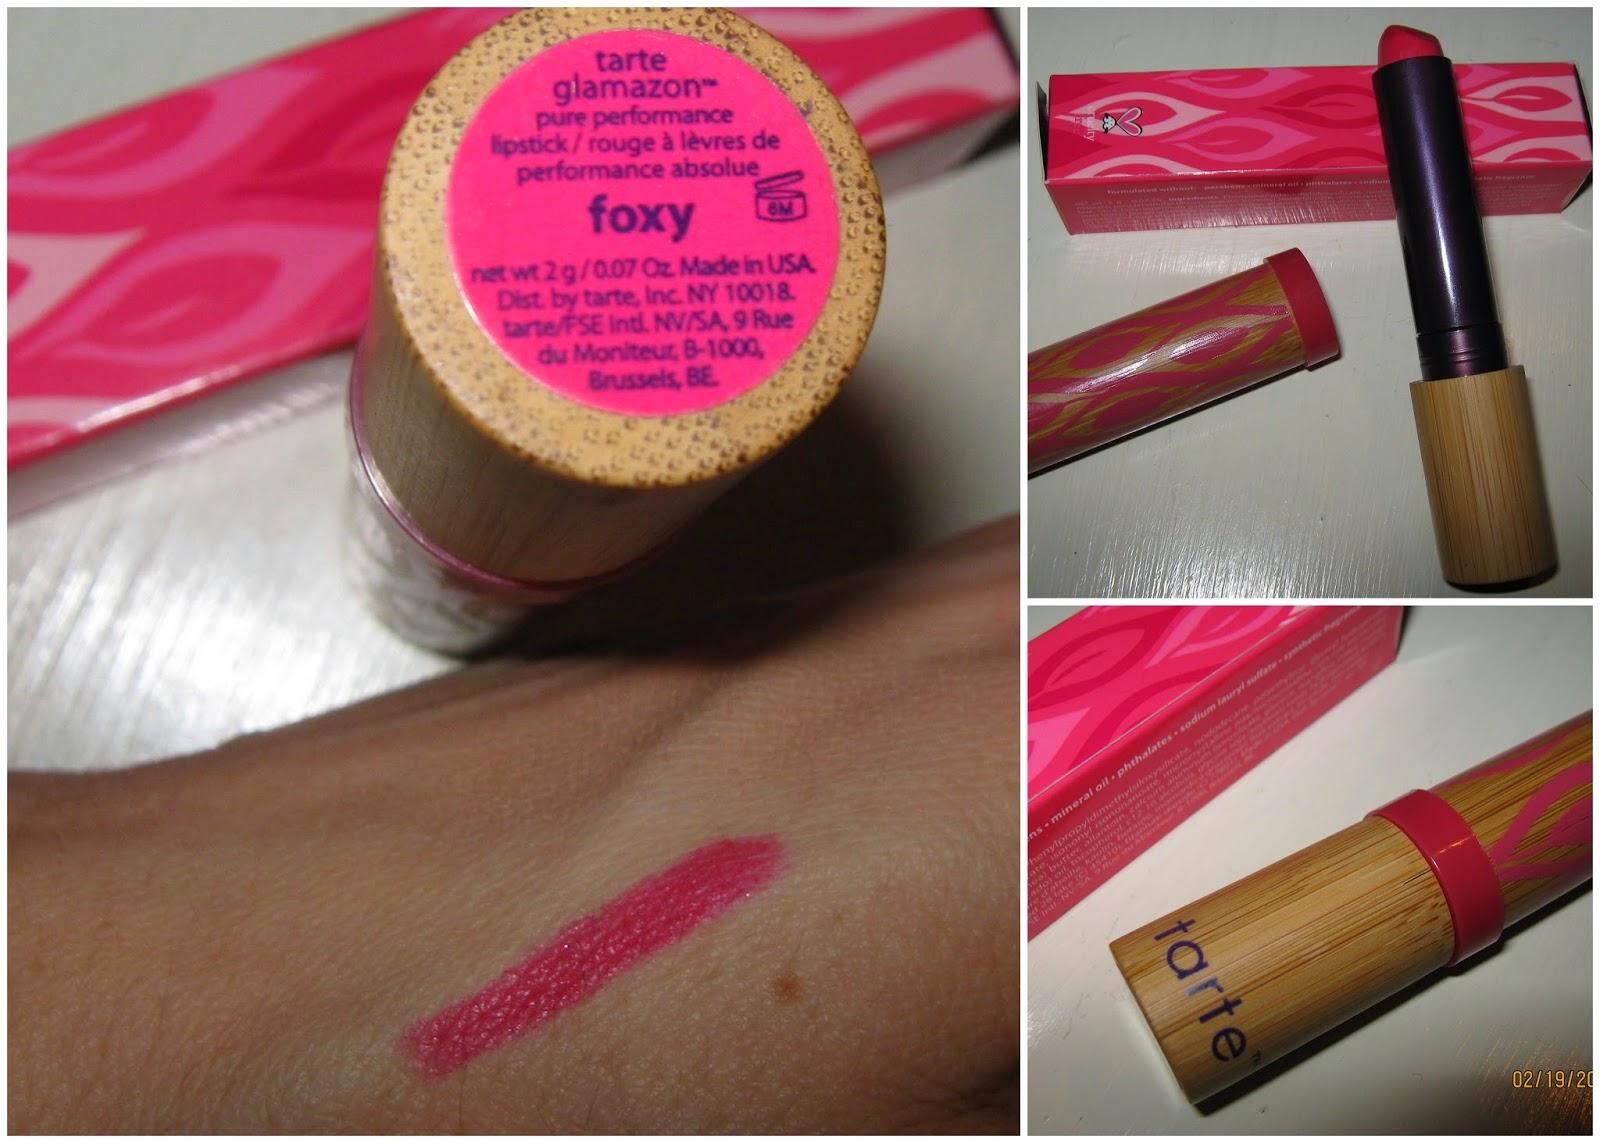 tarte glamazon lipstick foxy